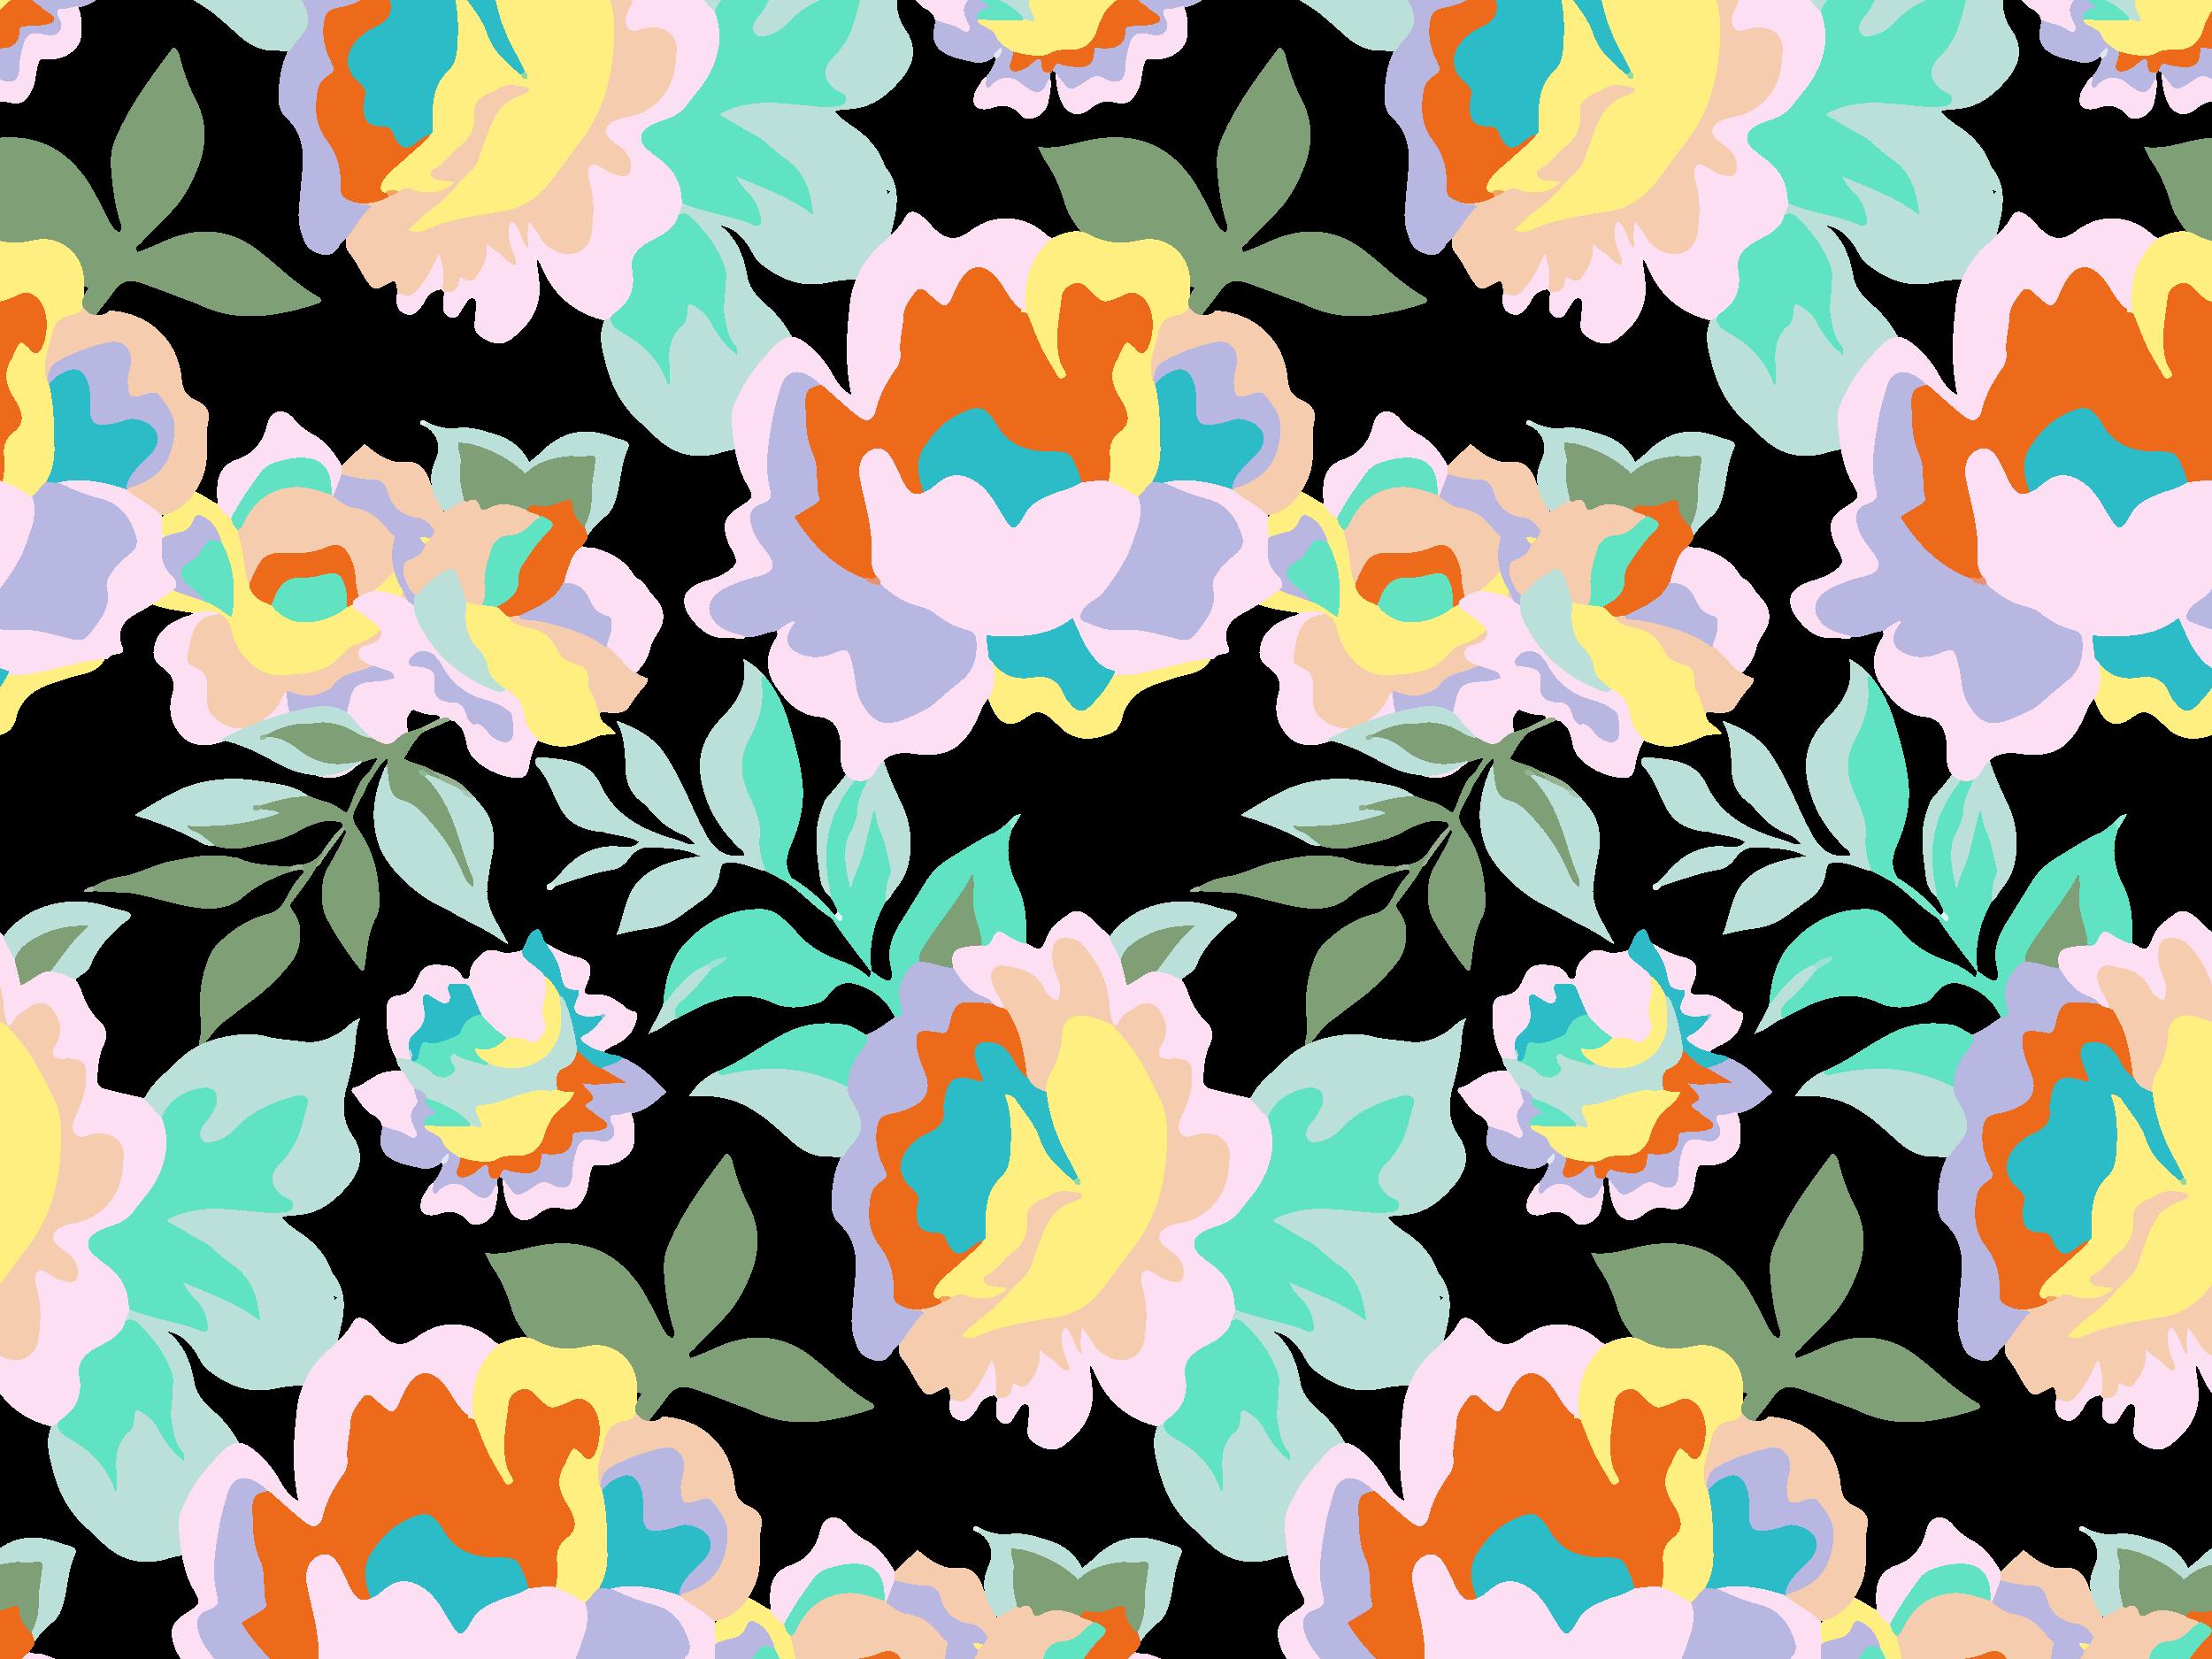 Rainbow Roses pattern in black by Melanie Hodge on Dribbble